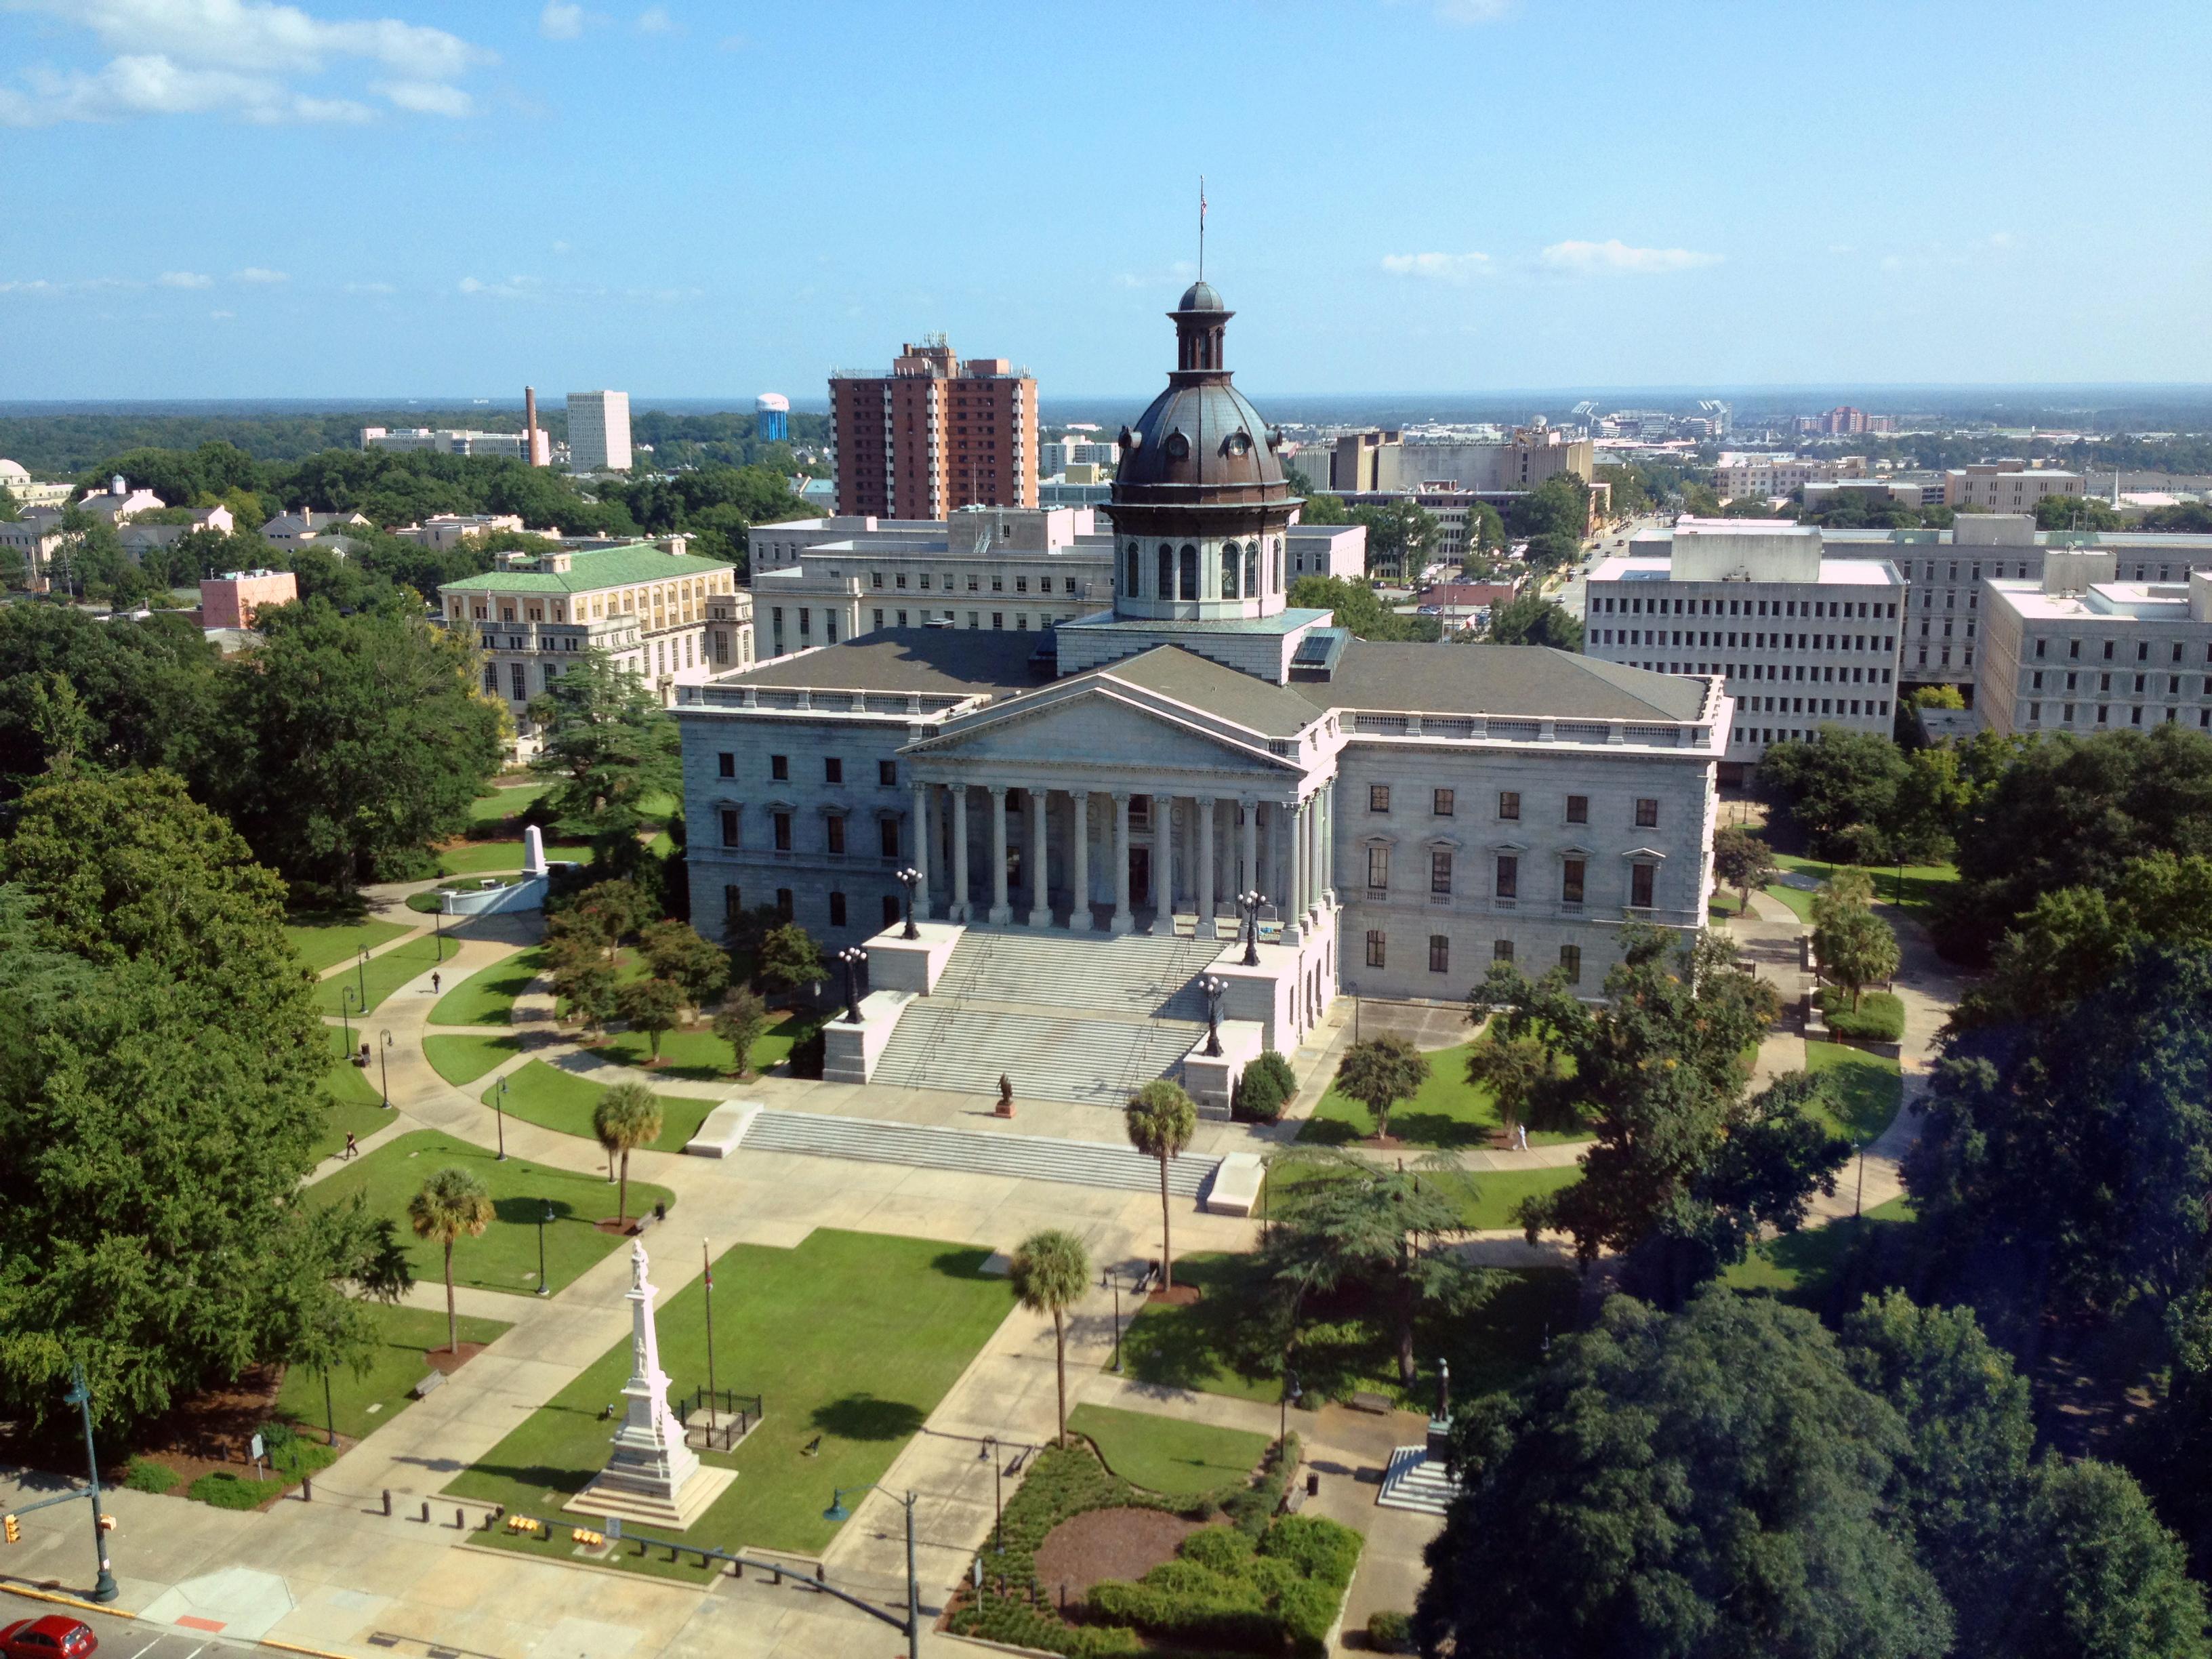 South Carolina State House JPG